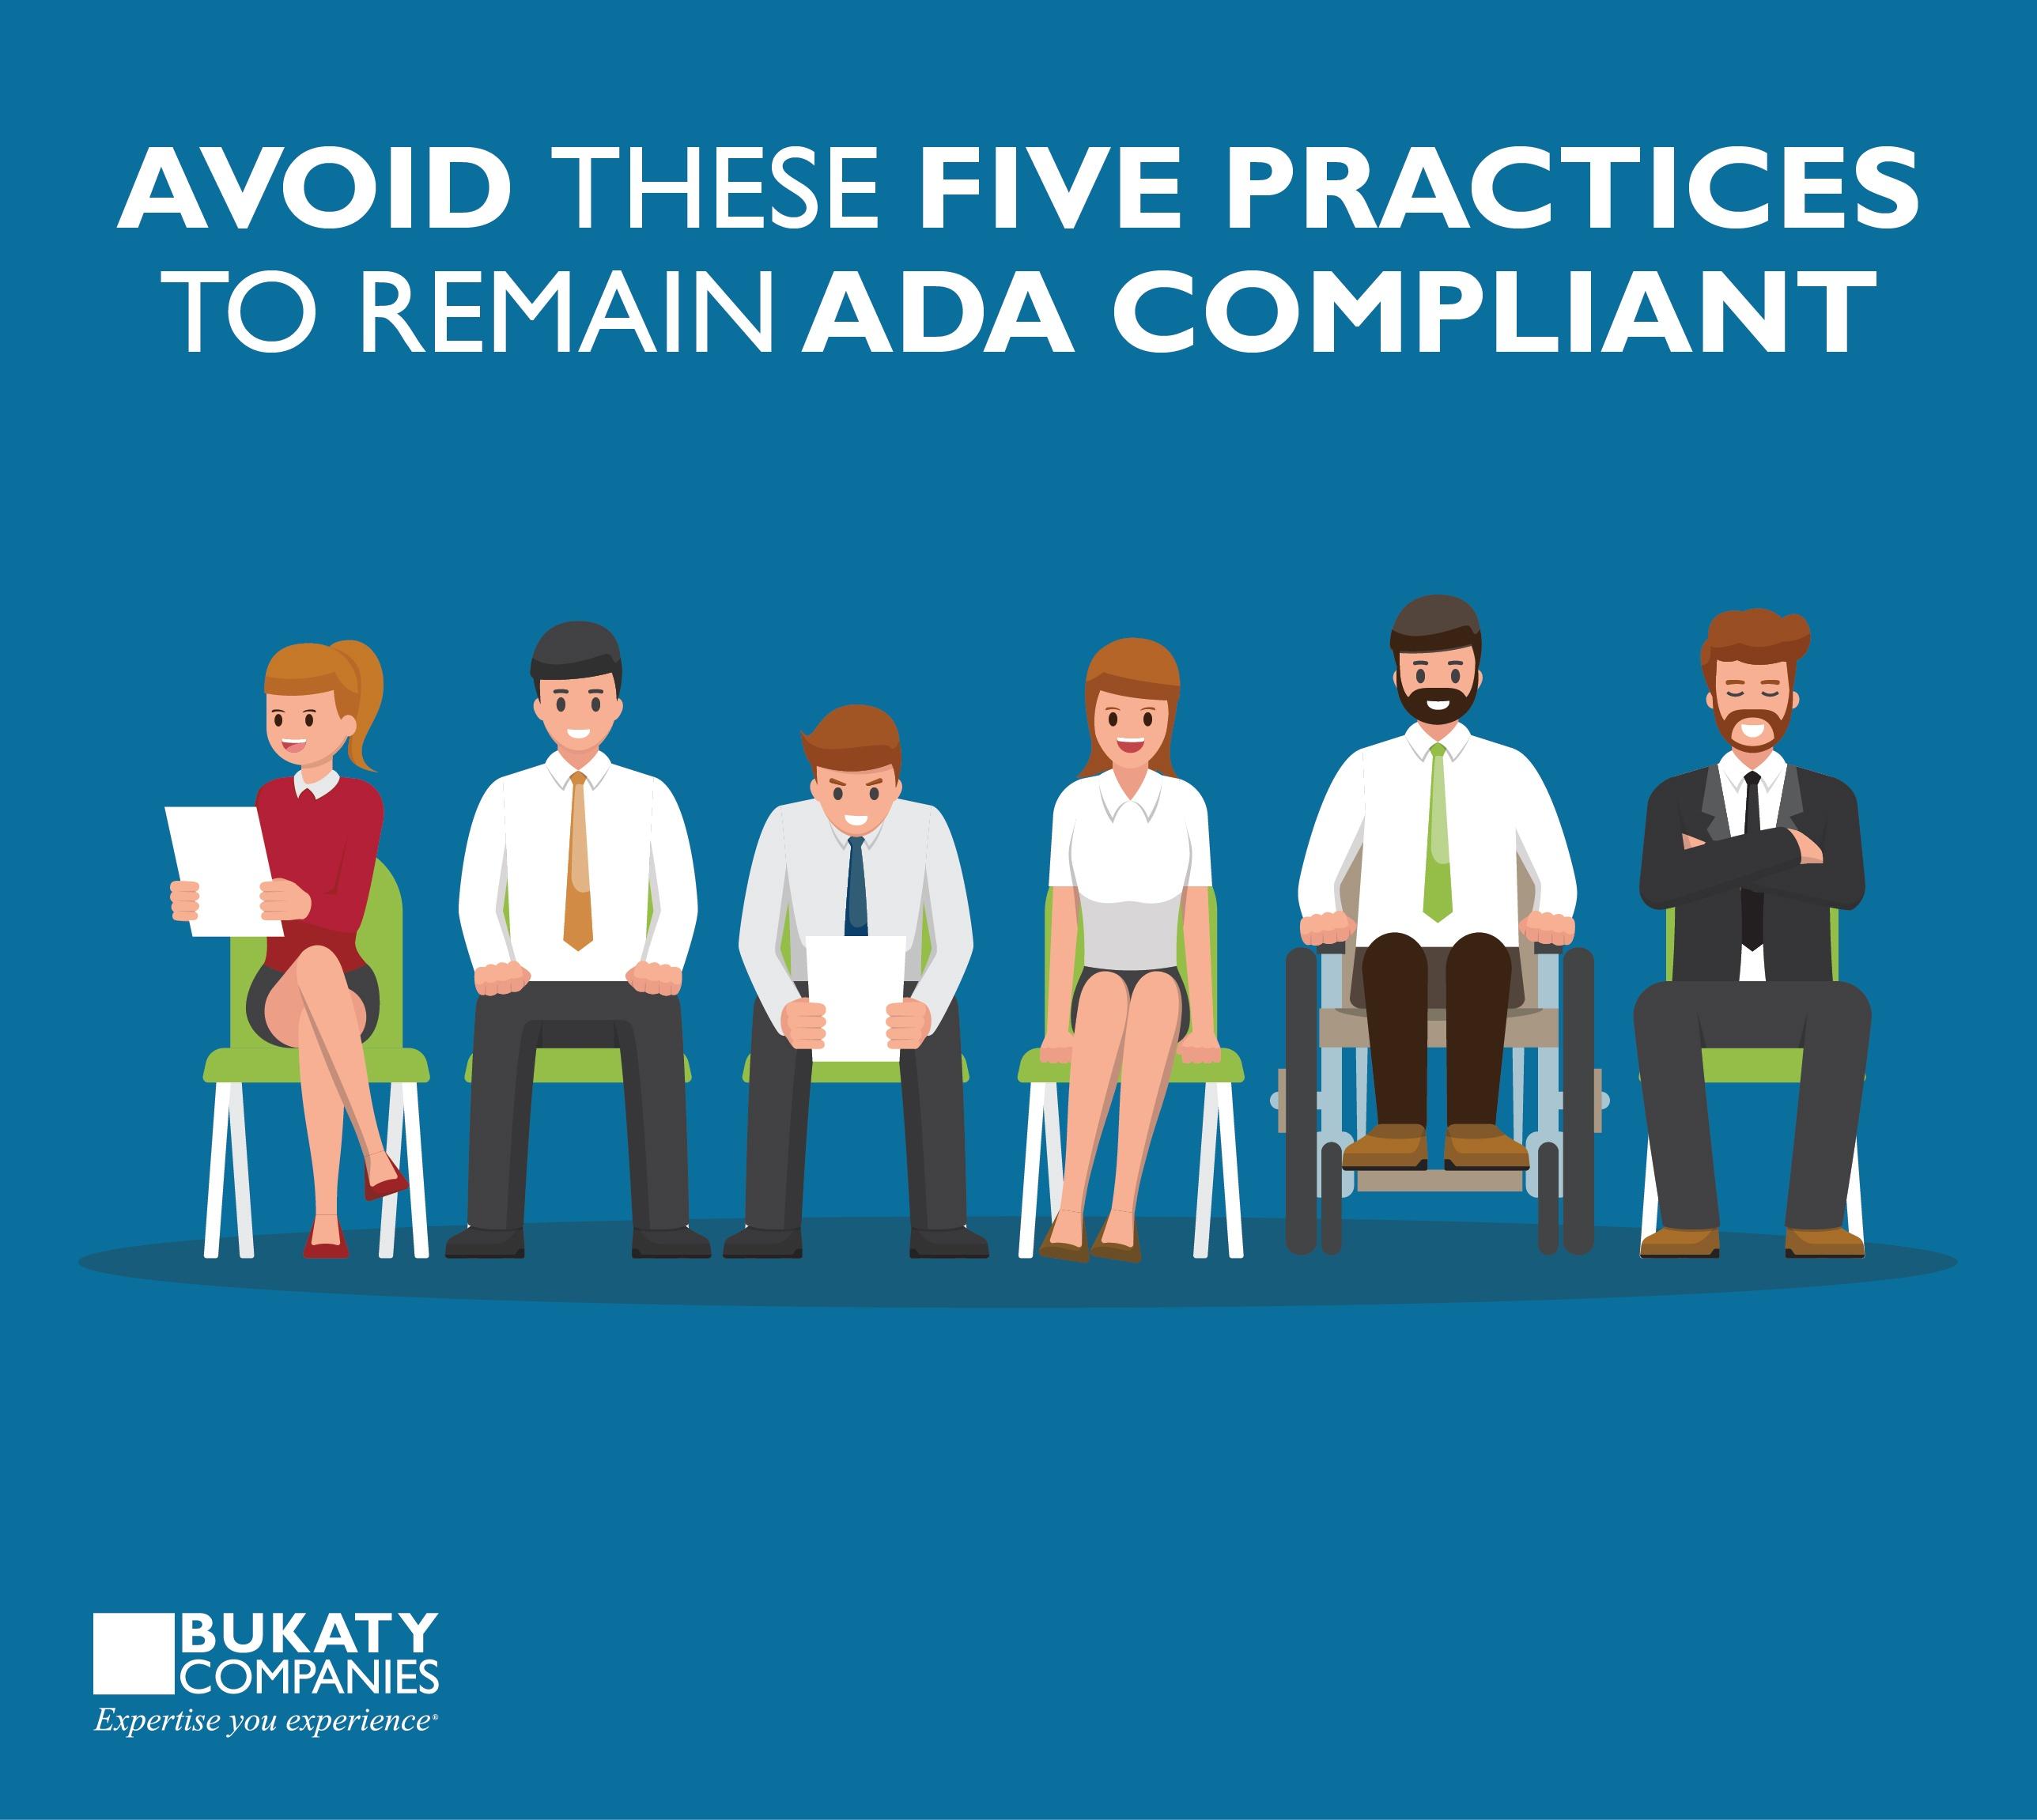 ADA_Compliance_LP_Image-01.jpg